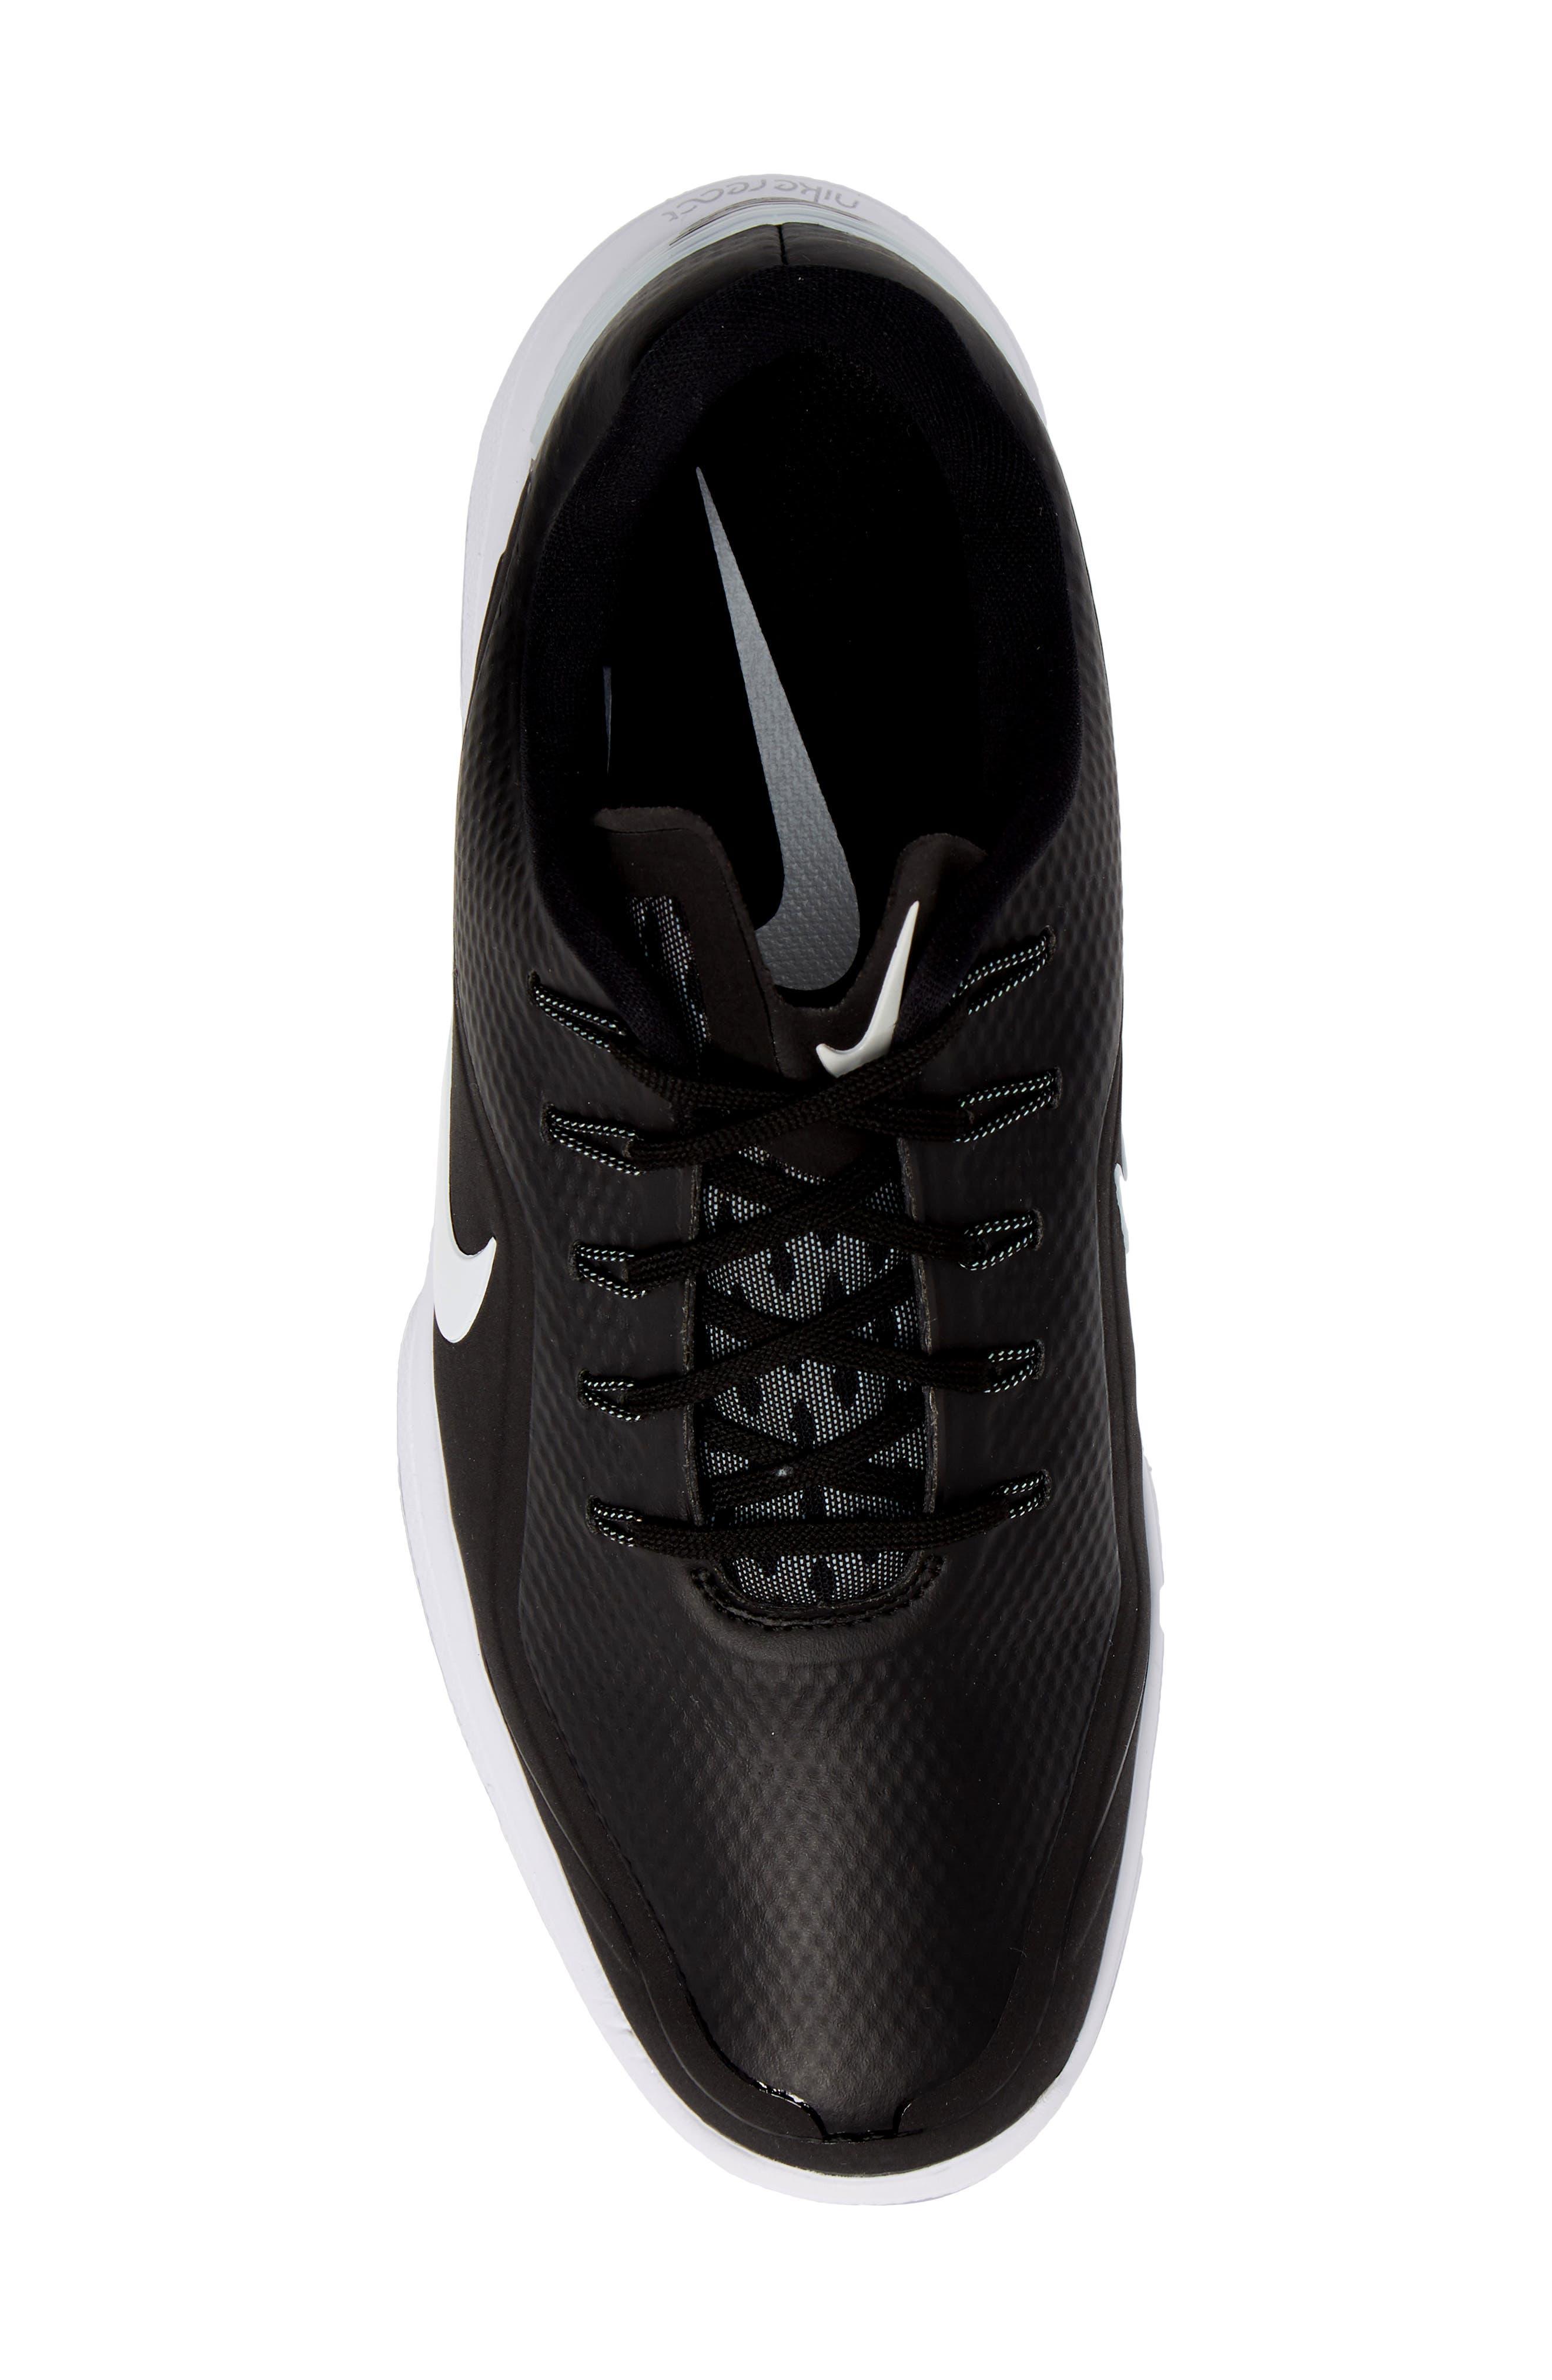 NIKE,                             React Vapor 2 Golf Shoe,                             Alternate thumbnail 5, color,                             BLACK/ METALLIC WHITE